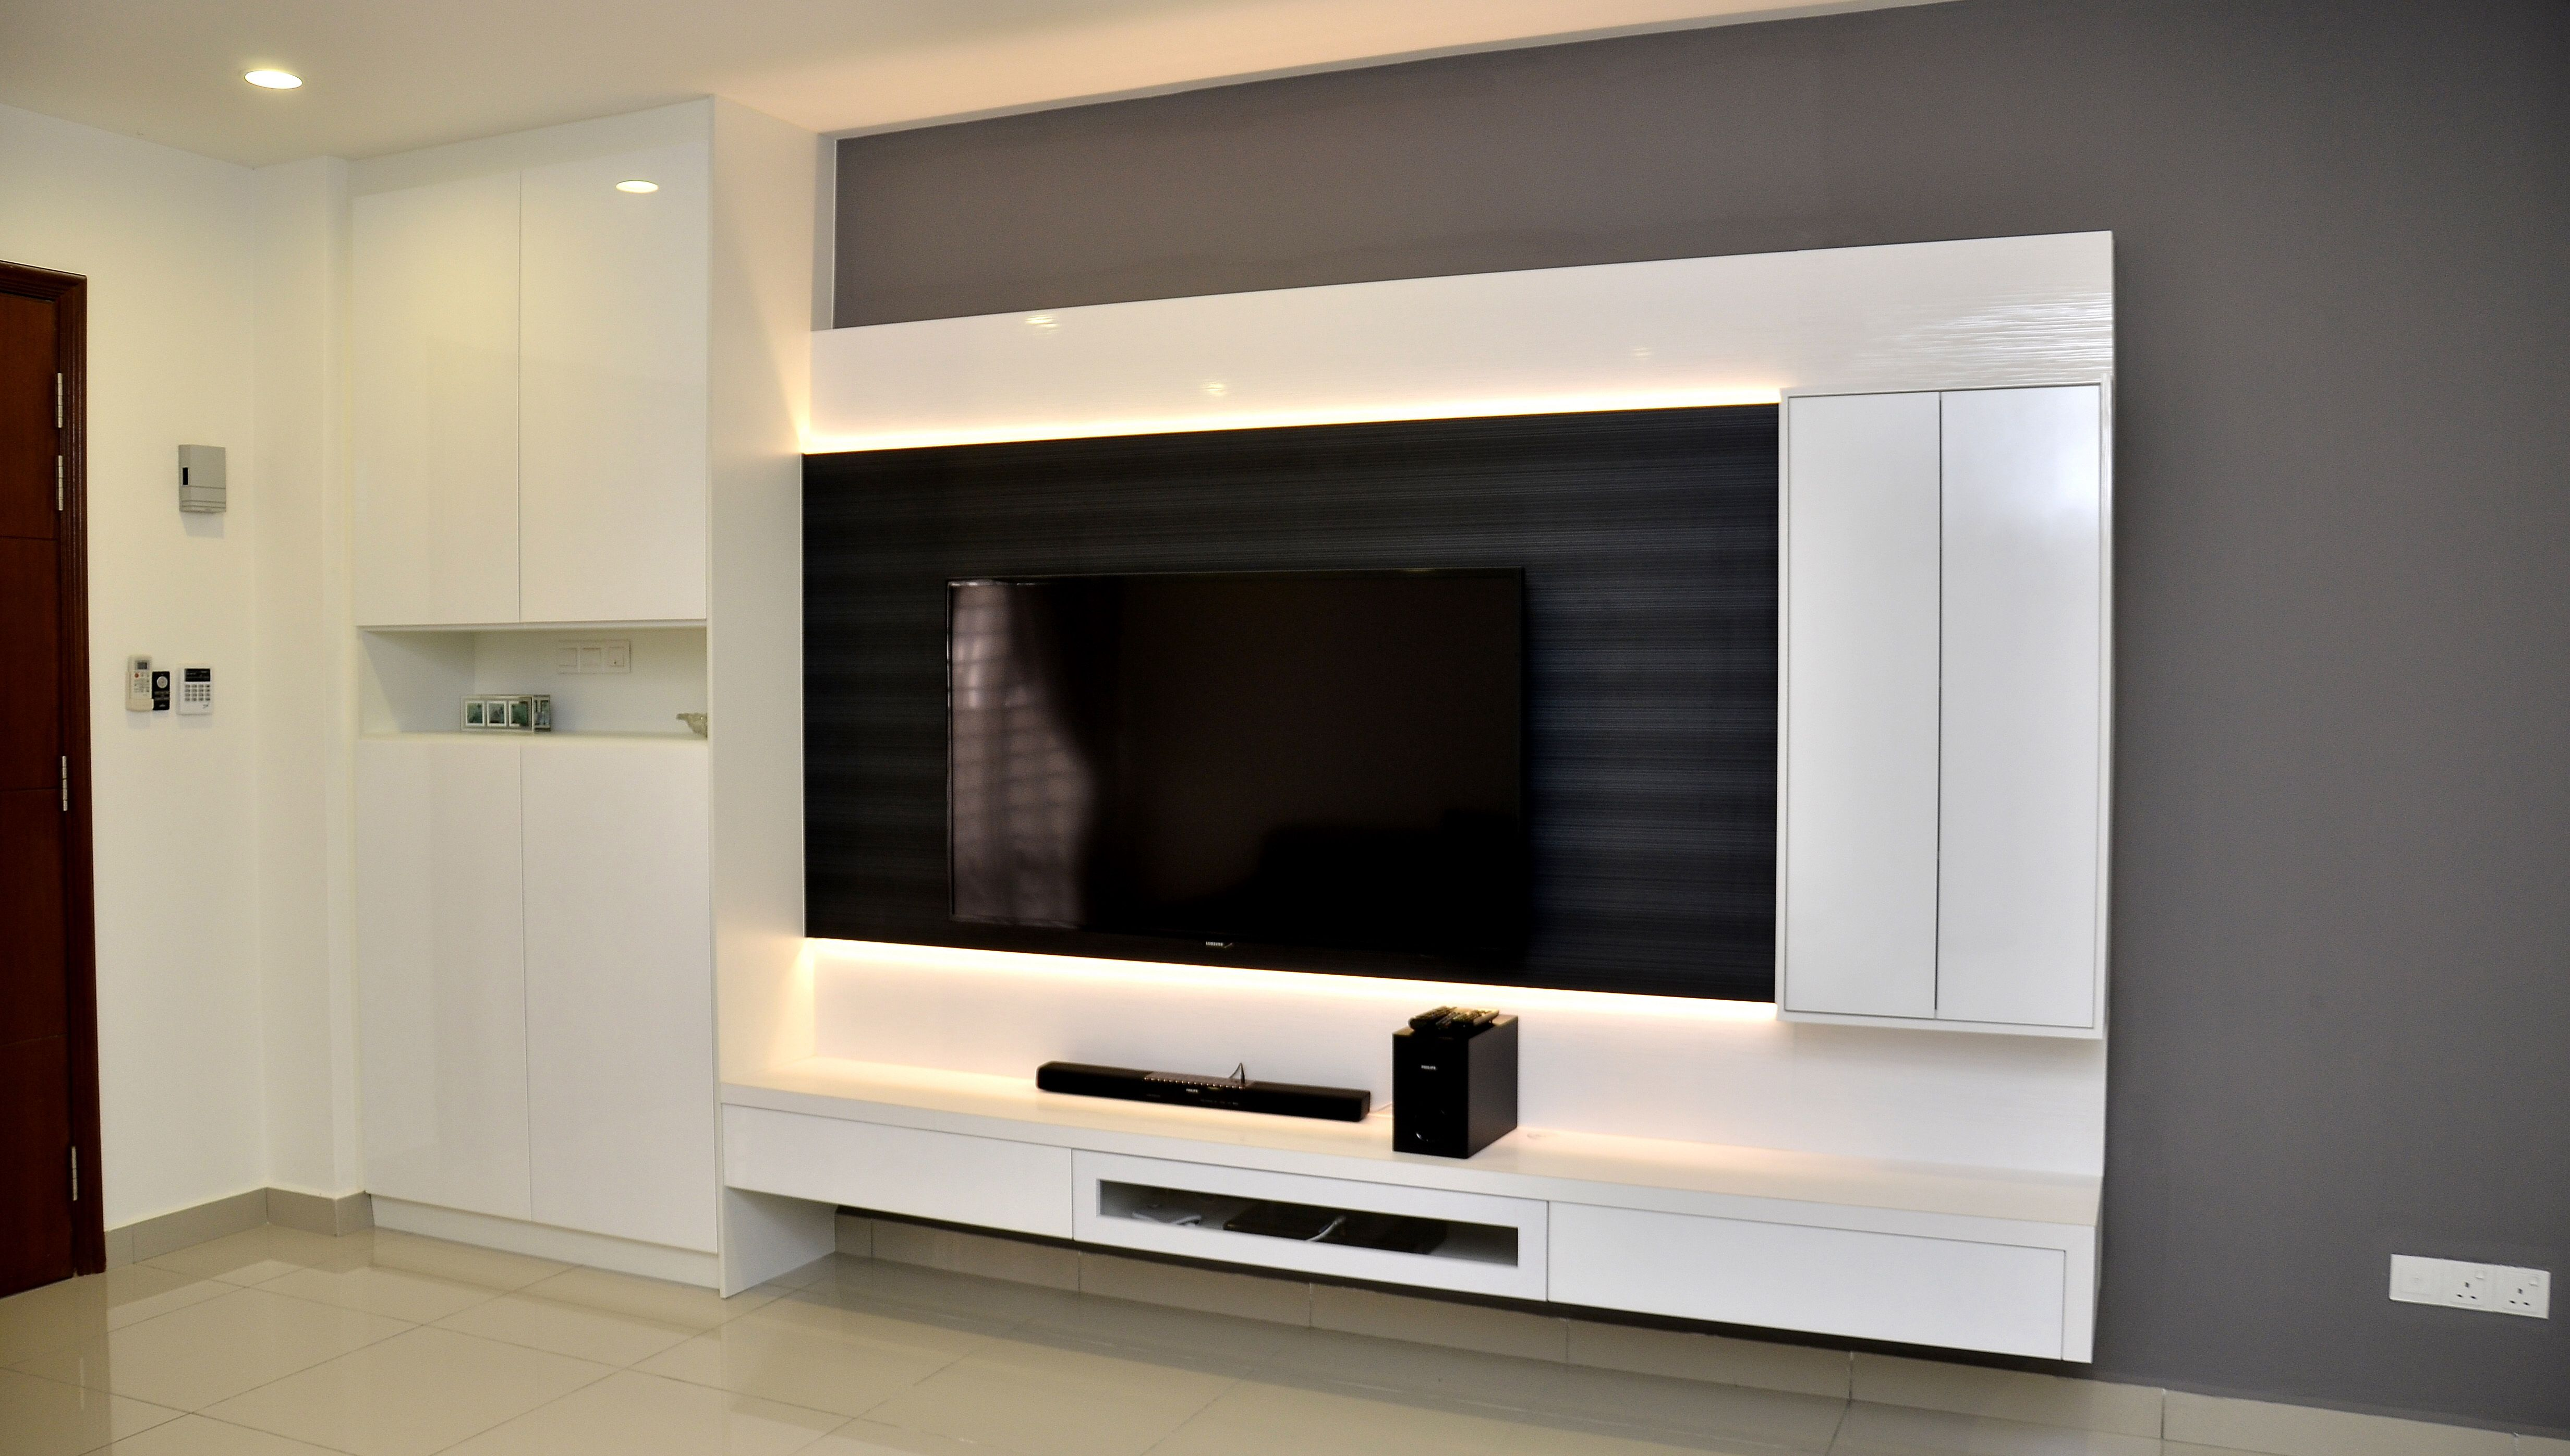 Living Room Cabinet Tvconsole Cabinet White Modern Livingroom Design Tv Cabinet